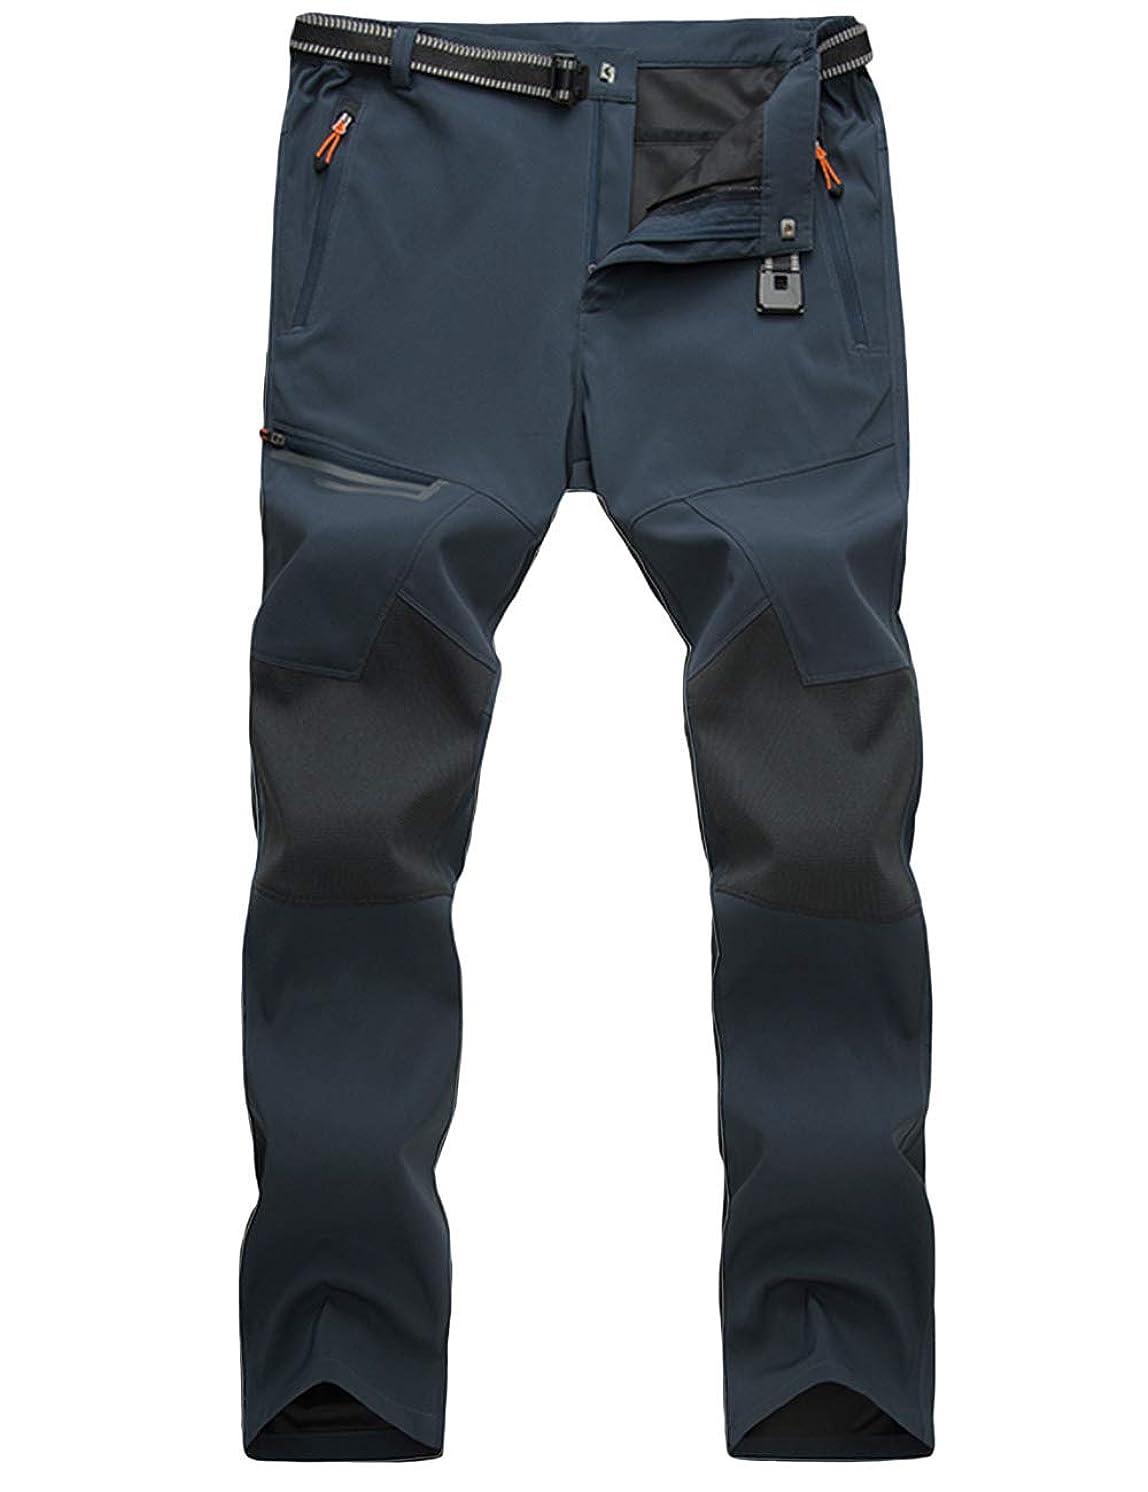 MAGCOMSEN Men's Outdoor Lightweight Hiking Camping Pants Multi Pockets Reinforced Knees Climbing Mountain Pants